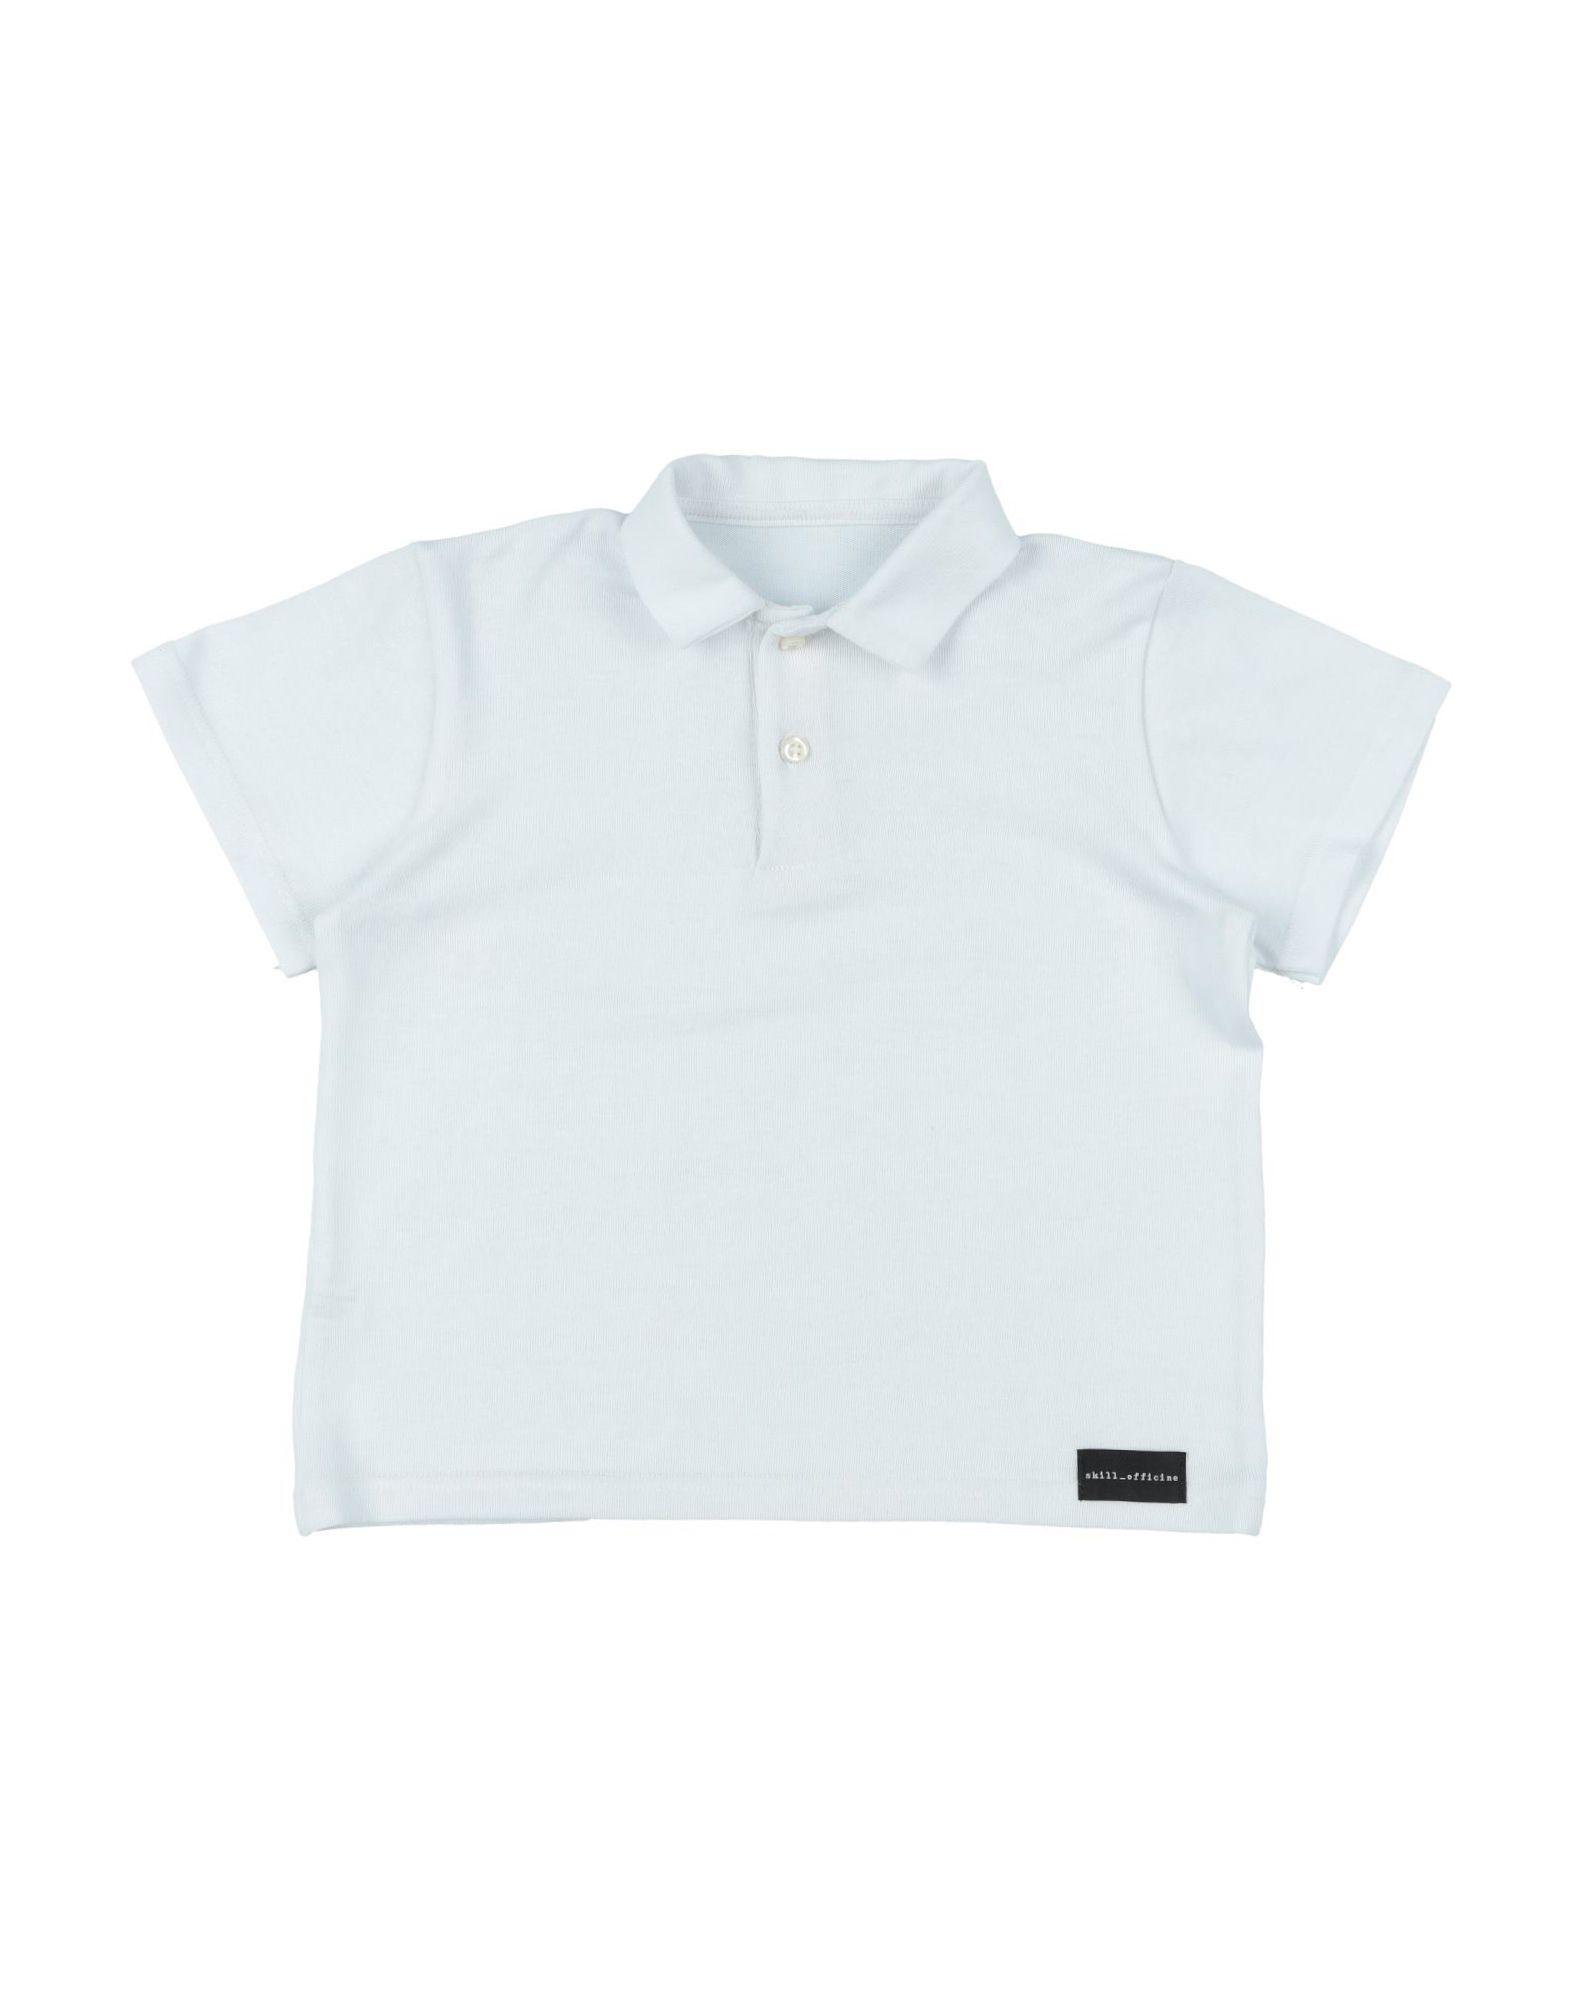 SKILL OFFICINE Sweaters - Item 14016038